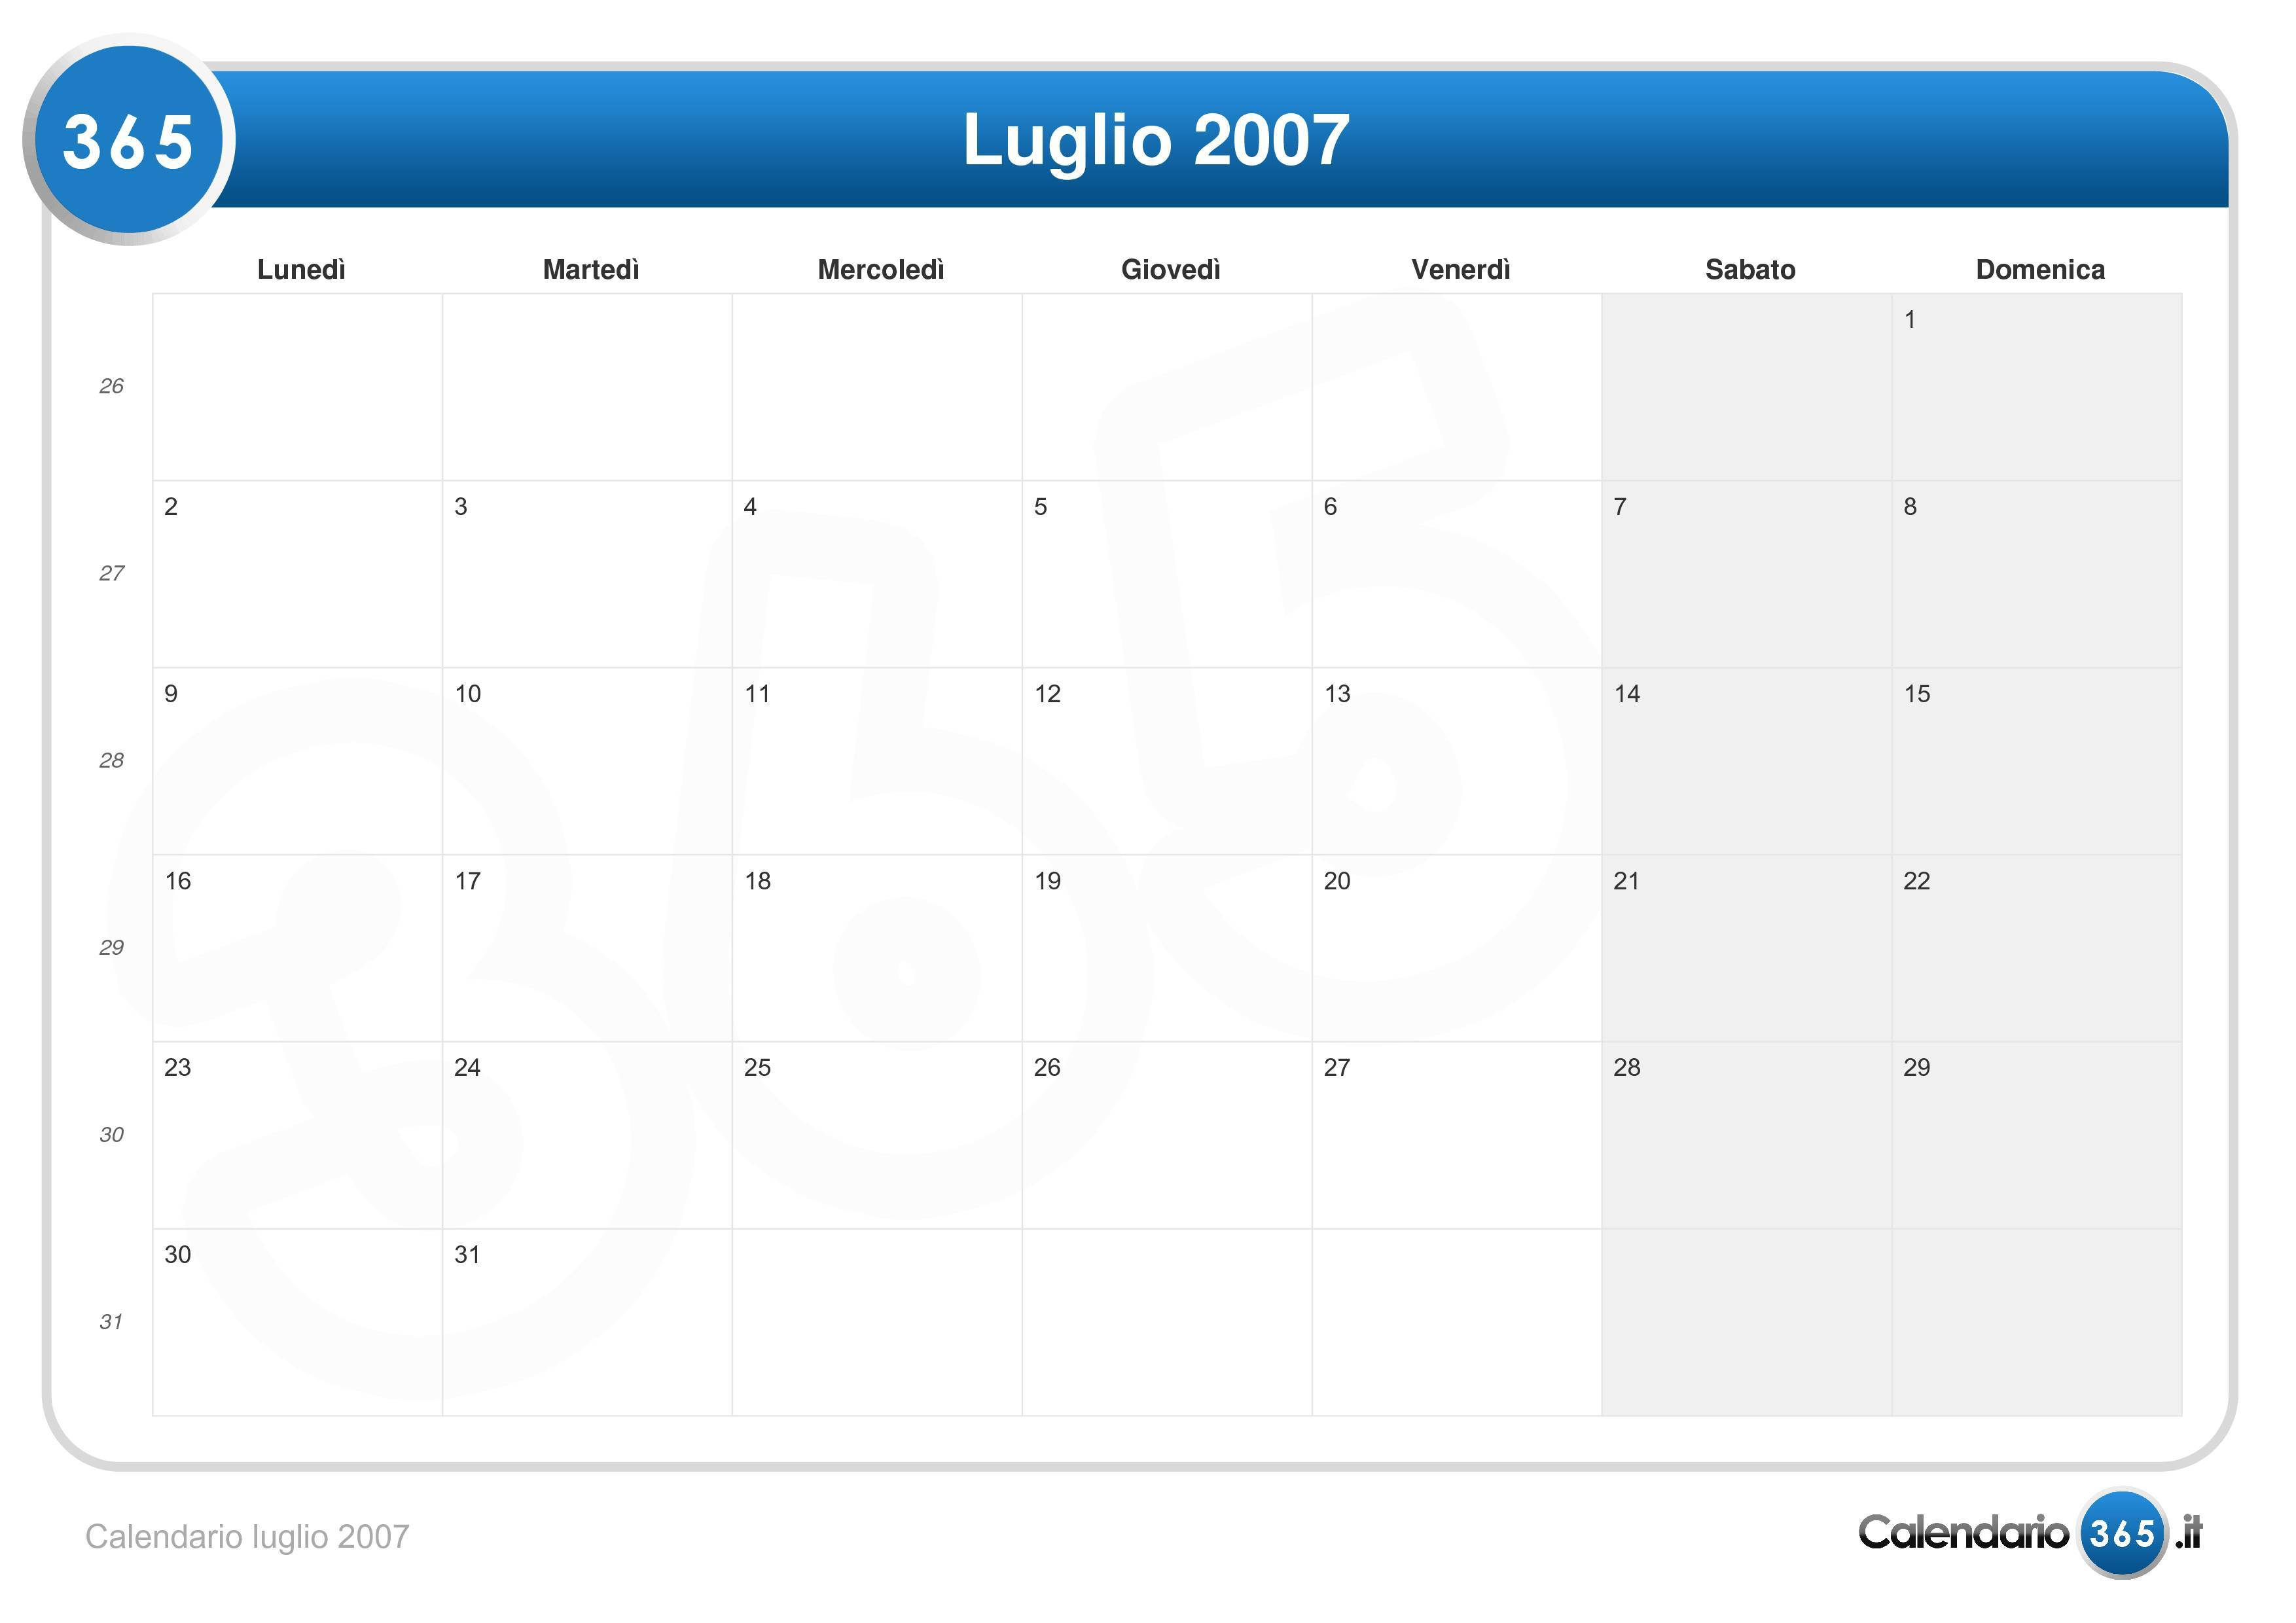 Calendario Luglio 2007.Calendario Luglio 2007